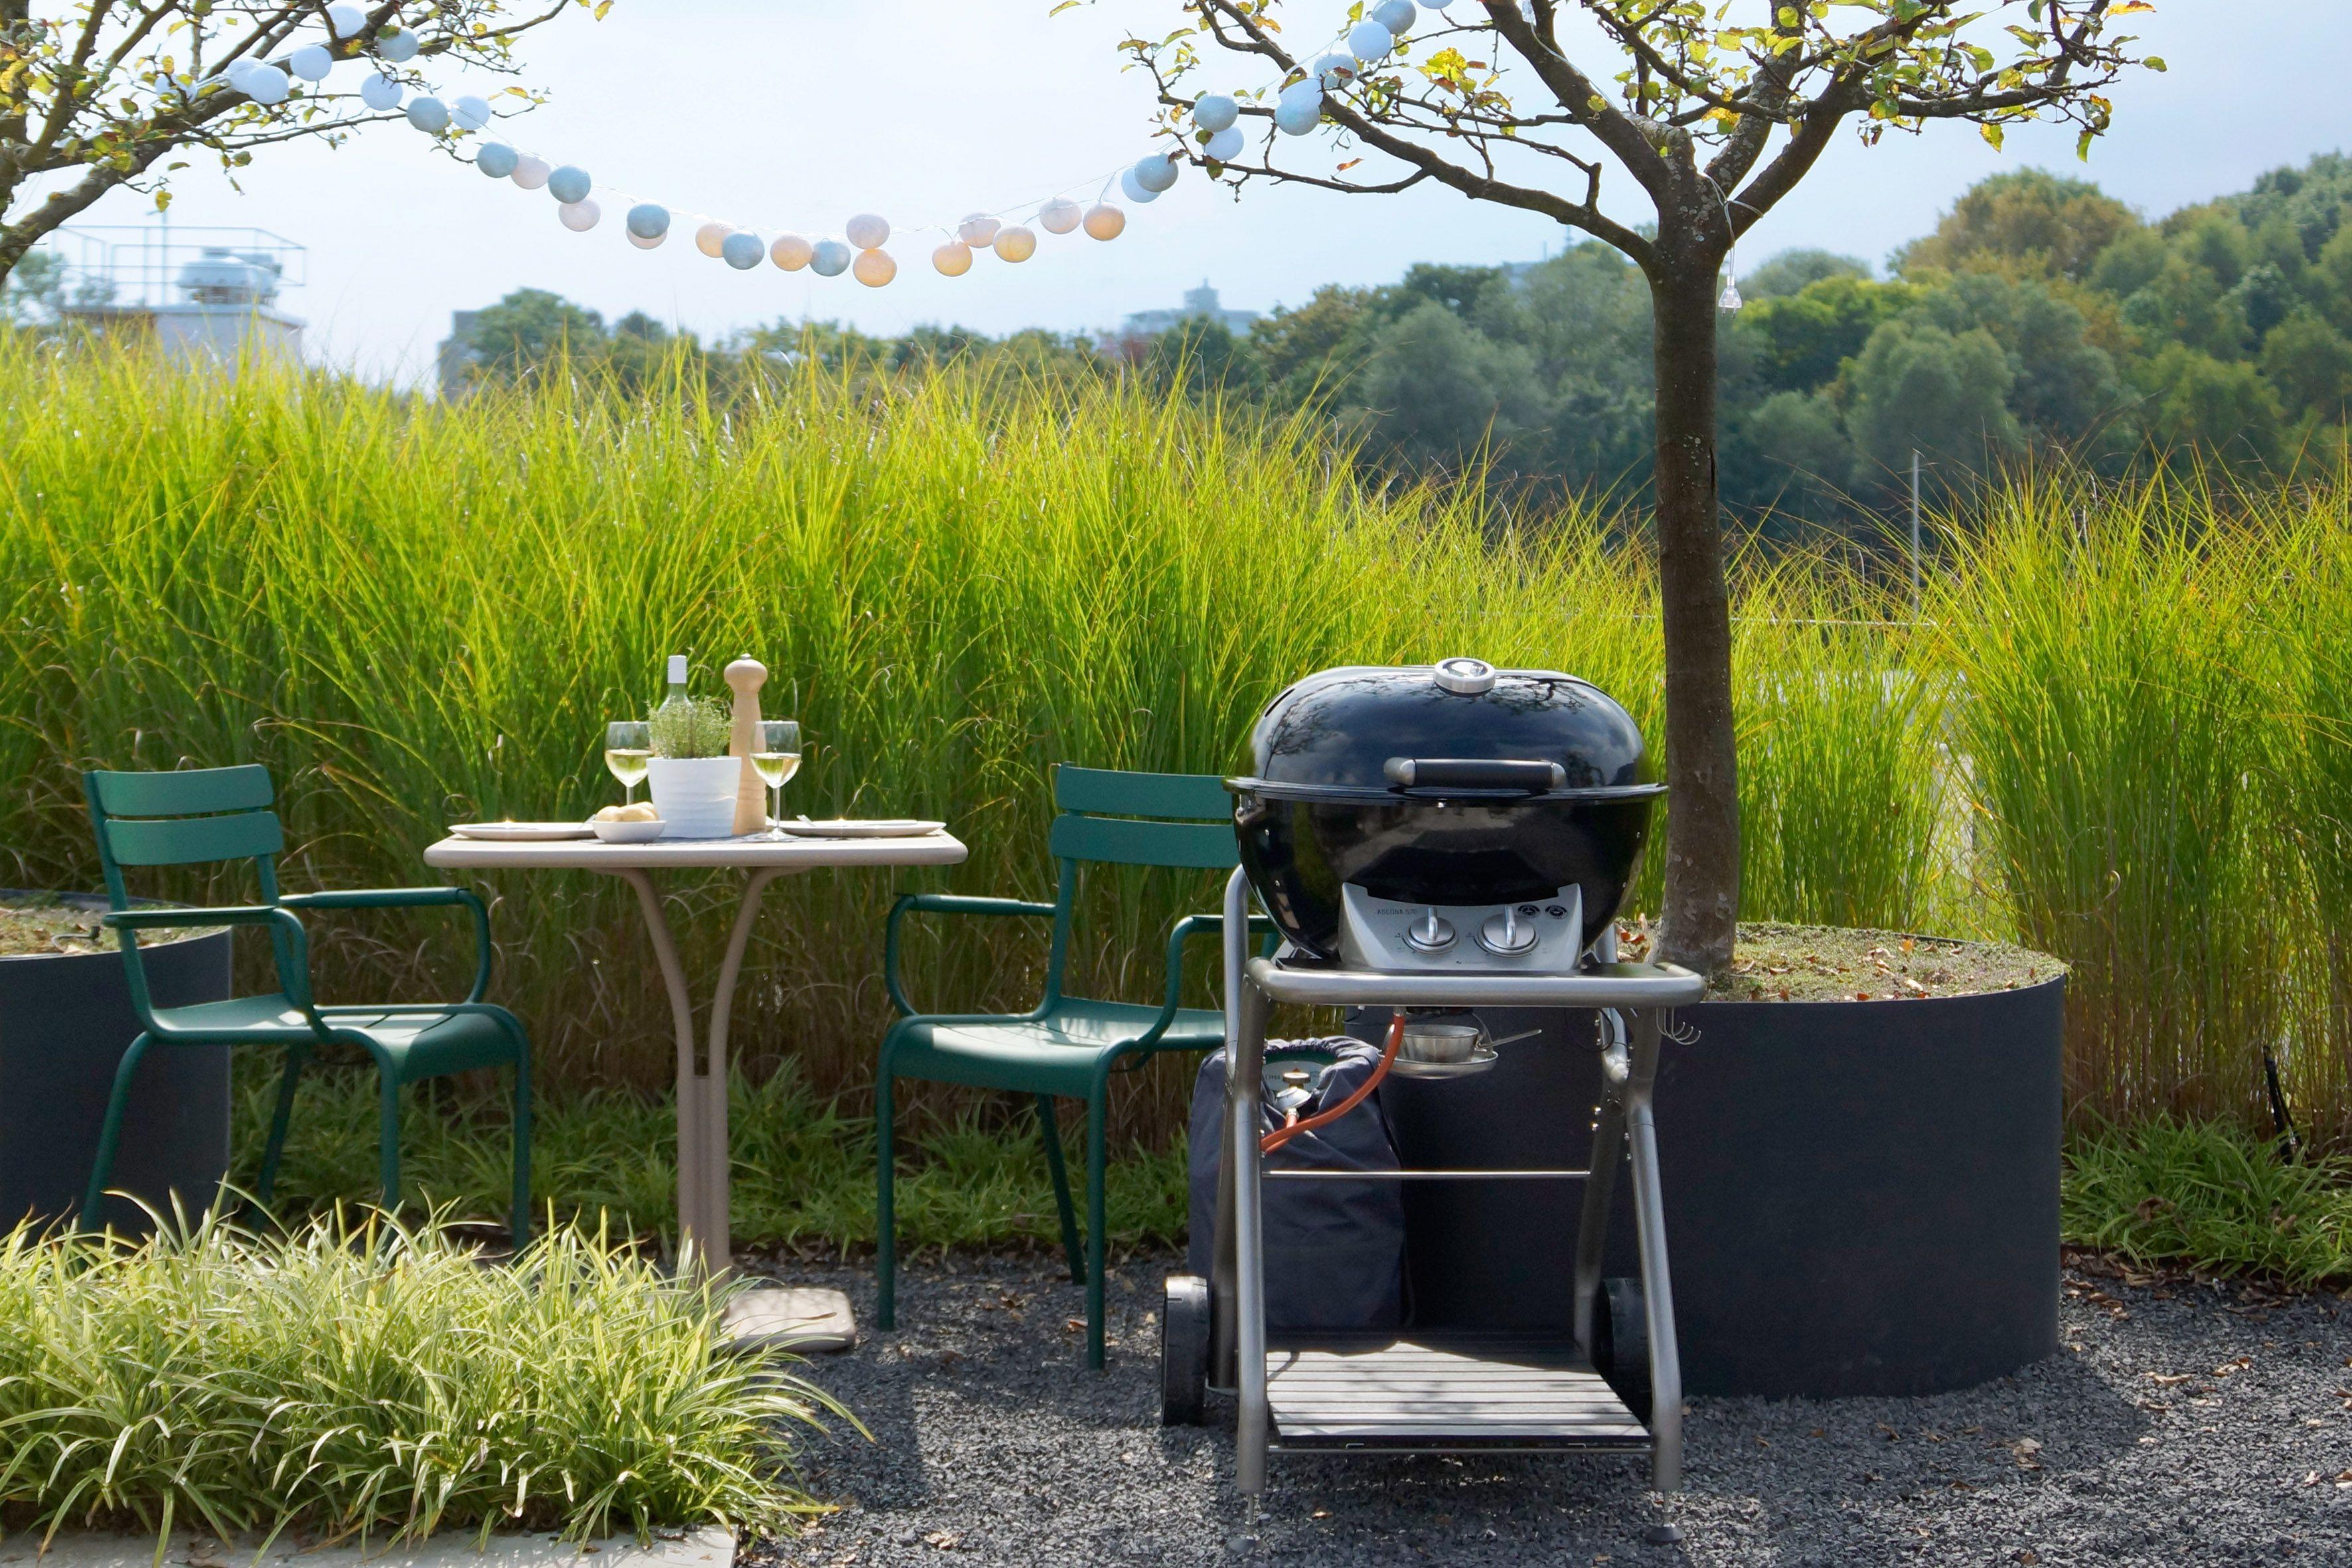 Outdoorchef Ascona 570G Black gas barbecue